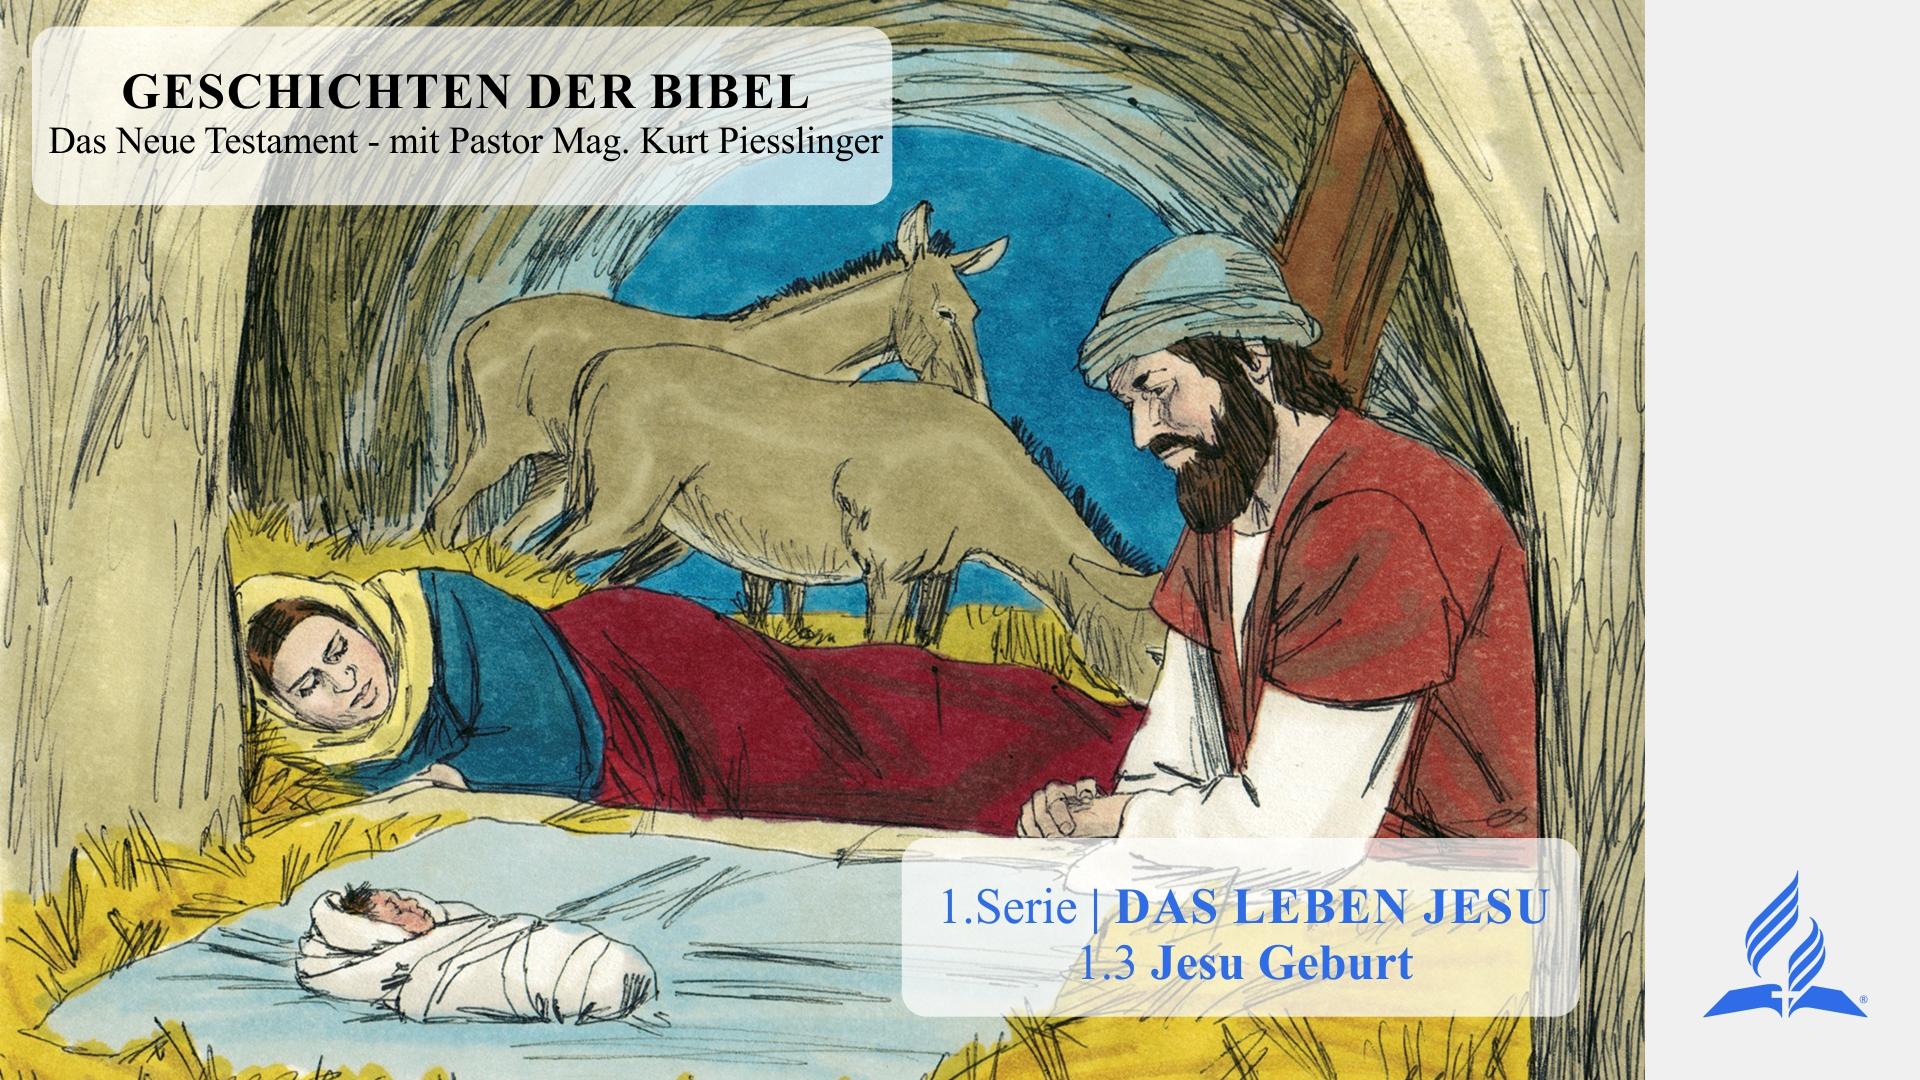 GESCHICHTEN DER BIBEL: 1.3 Jesu Geburt – 1.DAS LEBEN JESU | Pastor Mag. Kurt Piesslinger